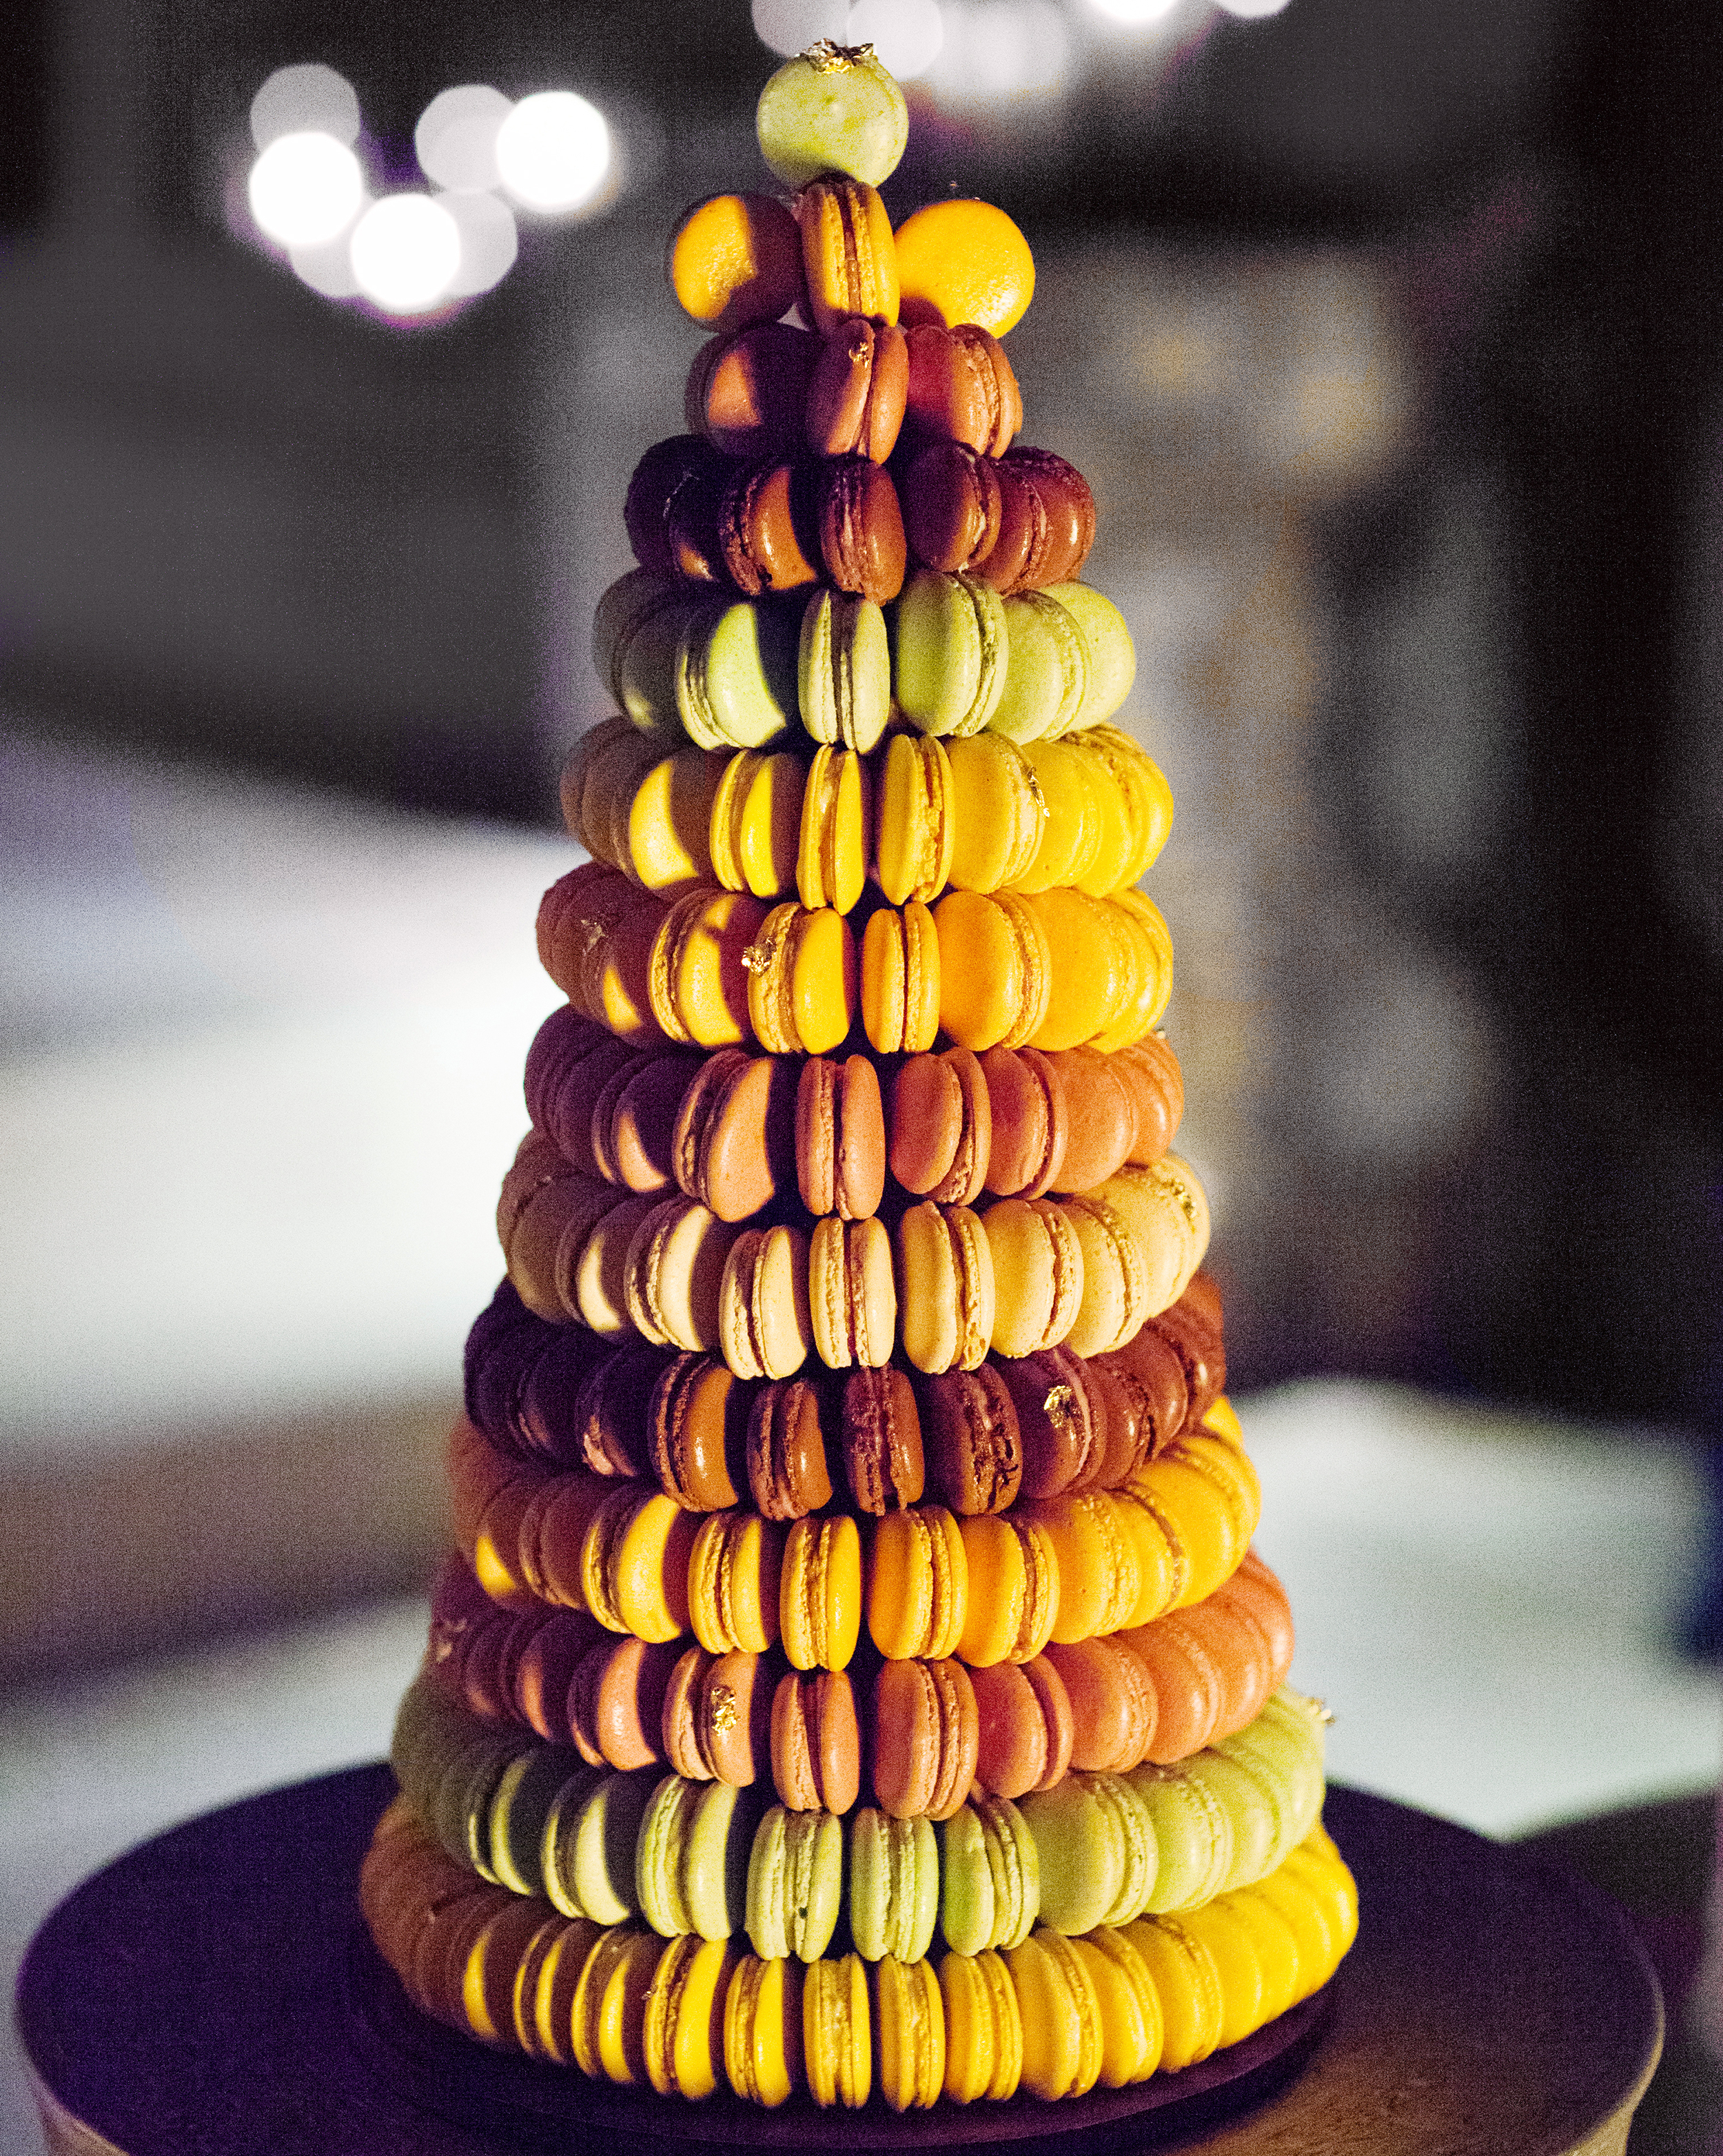 veronica-mathieu-wedding-cake-1328-s111501-1014.jpg